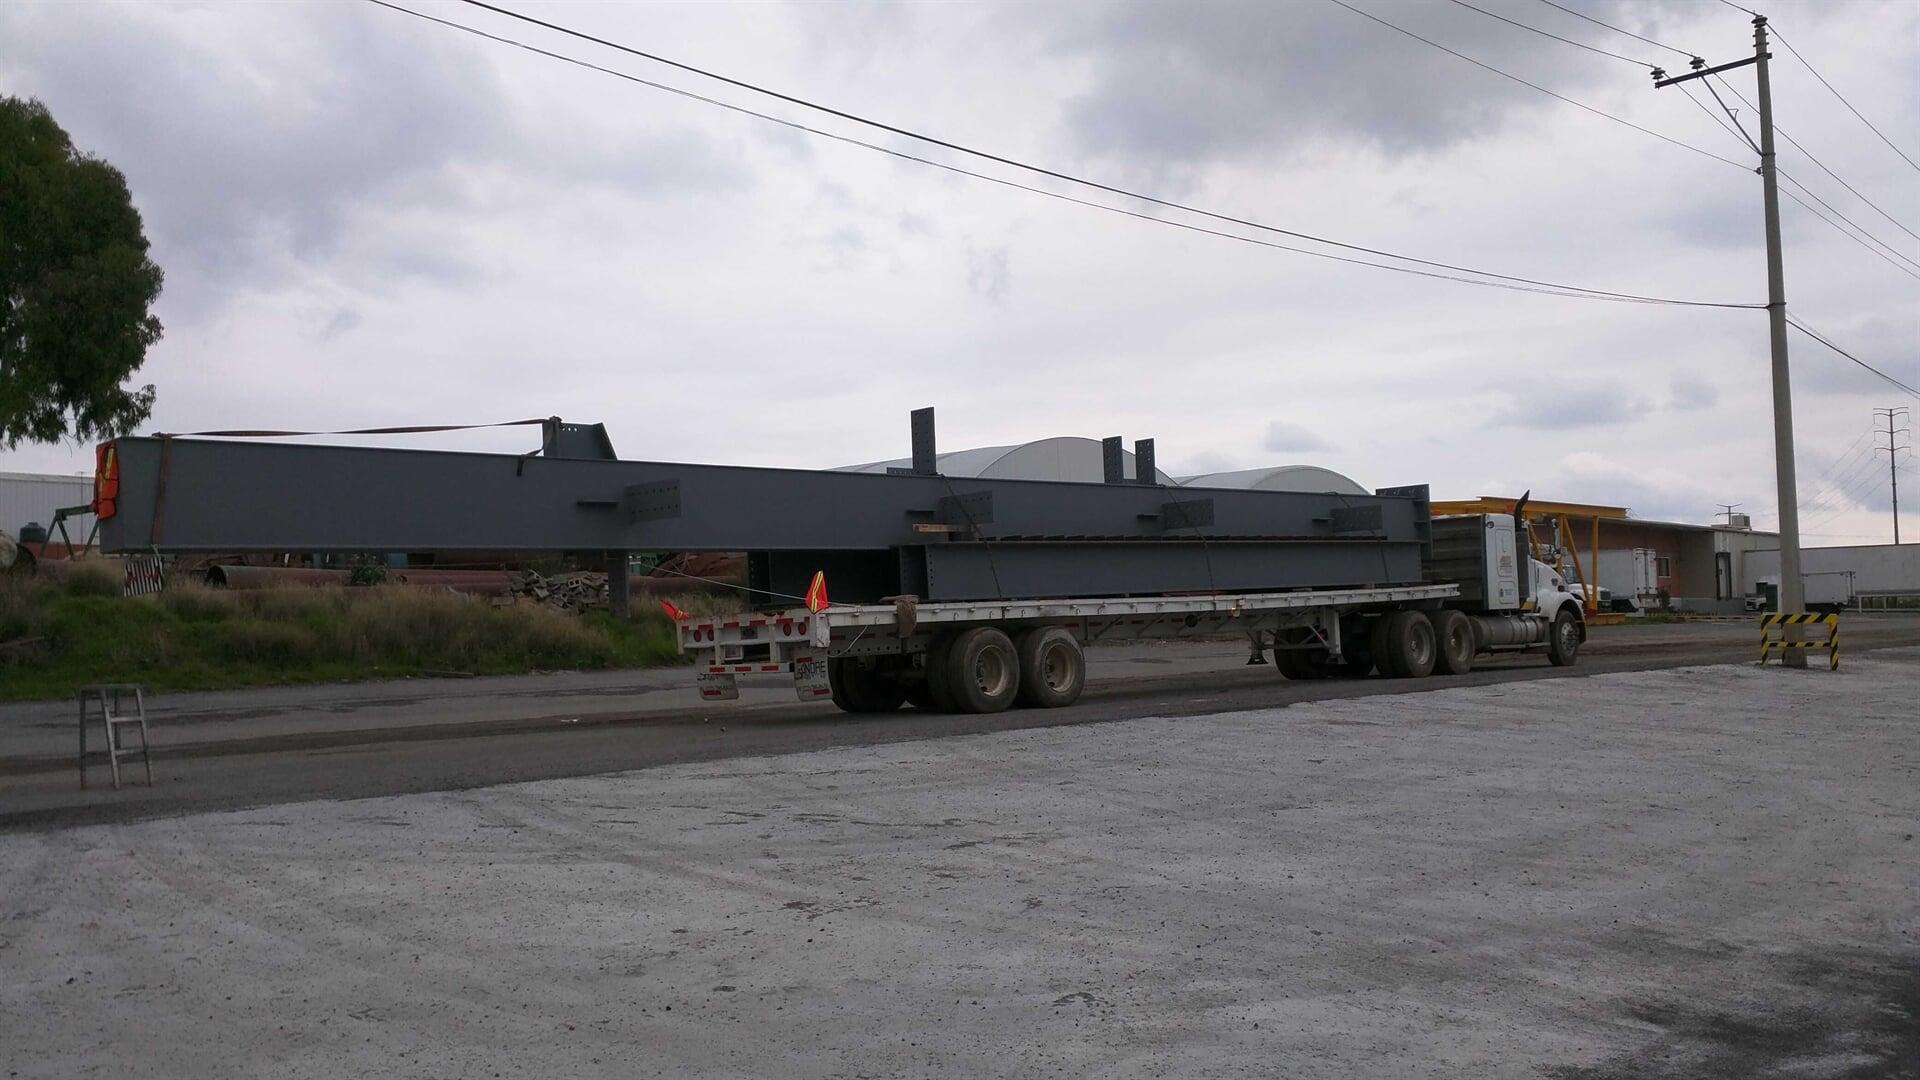 SANDRE TRANSPORTE DE MAQUINARIA - Reubicación de maquinaria o equipo industrial